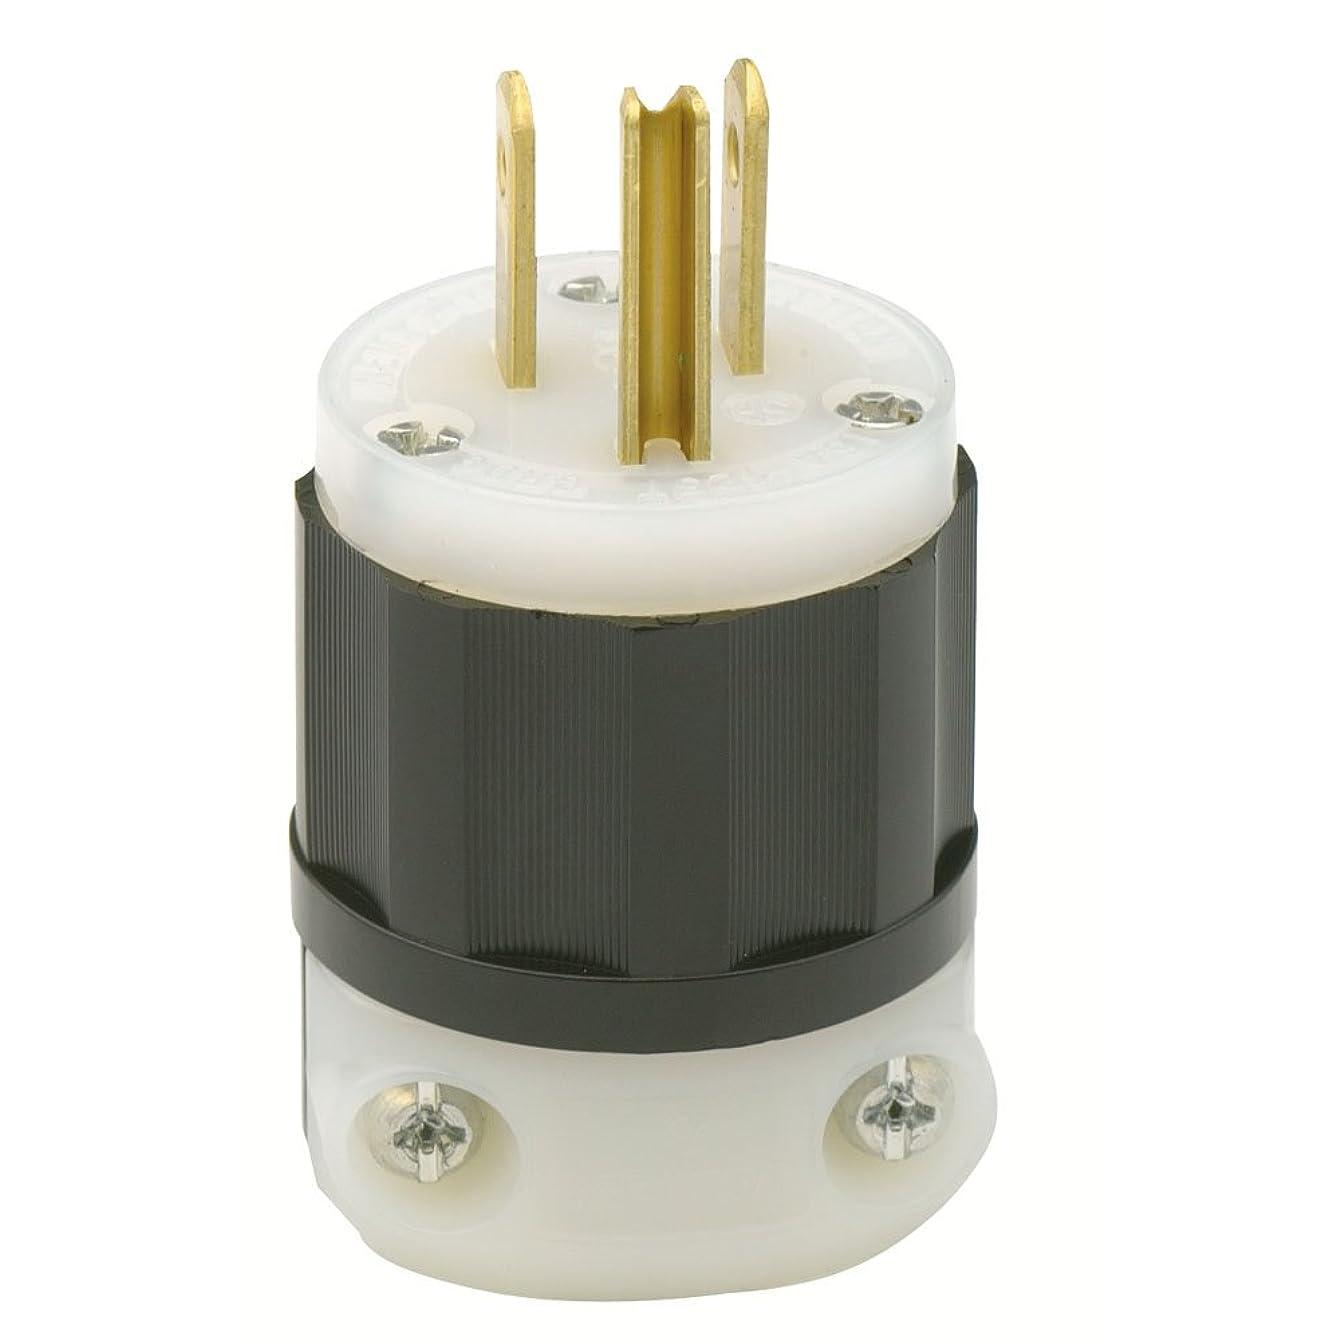 Leviton 5266-C 15 Amp, 125 Volt, Industrial Grade, Plug, Straight Blade, Grounding, Black-White, 1 Pack,